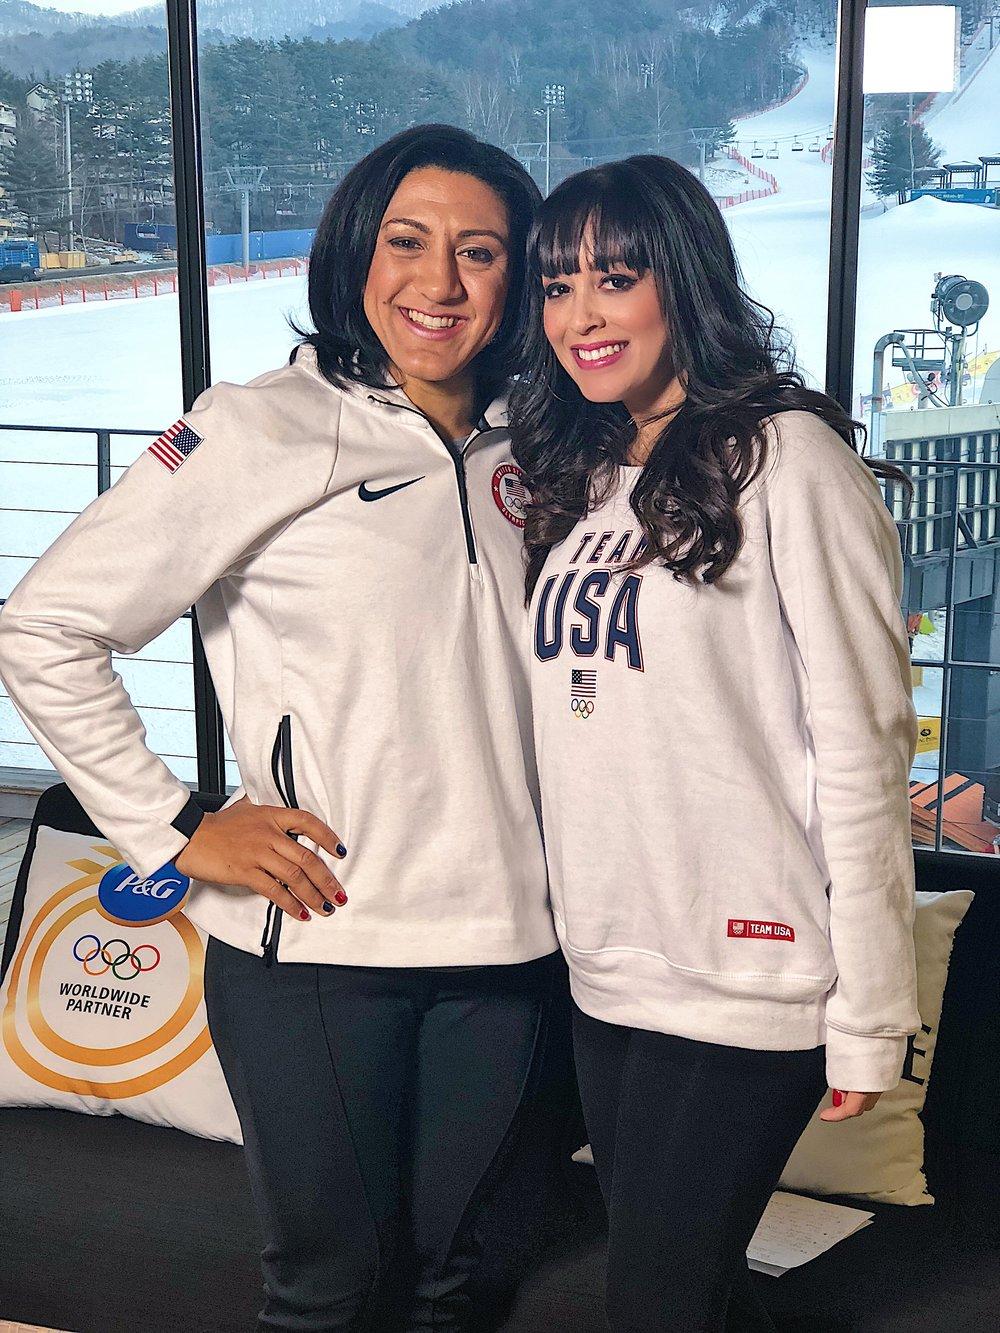 Winter Olympics Games Spanglishfashion 2018 (14).JPG